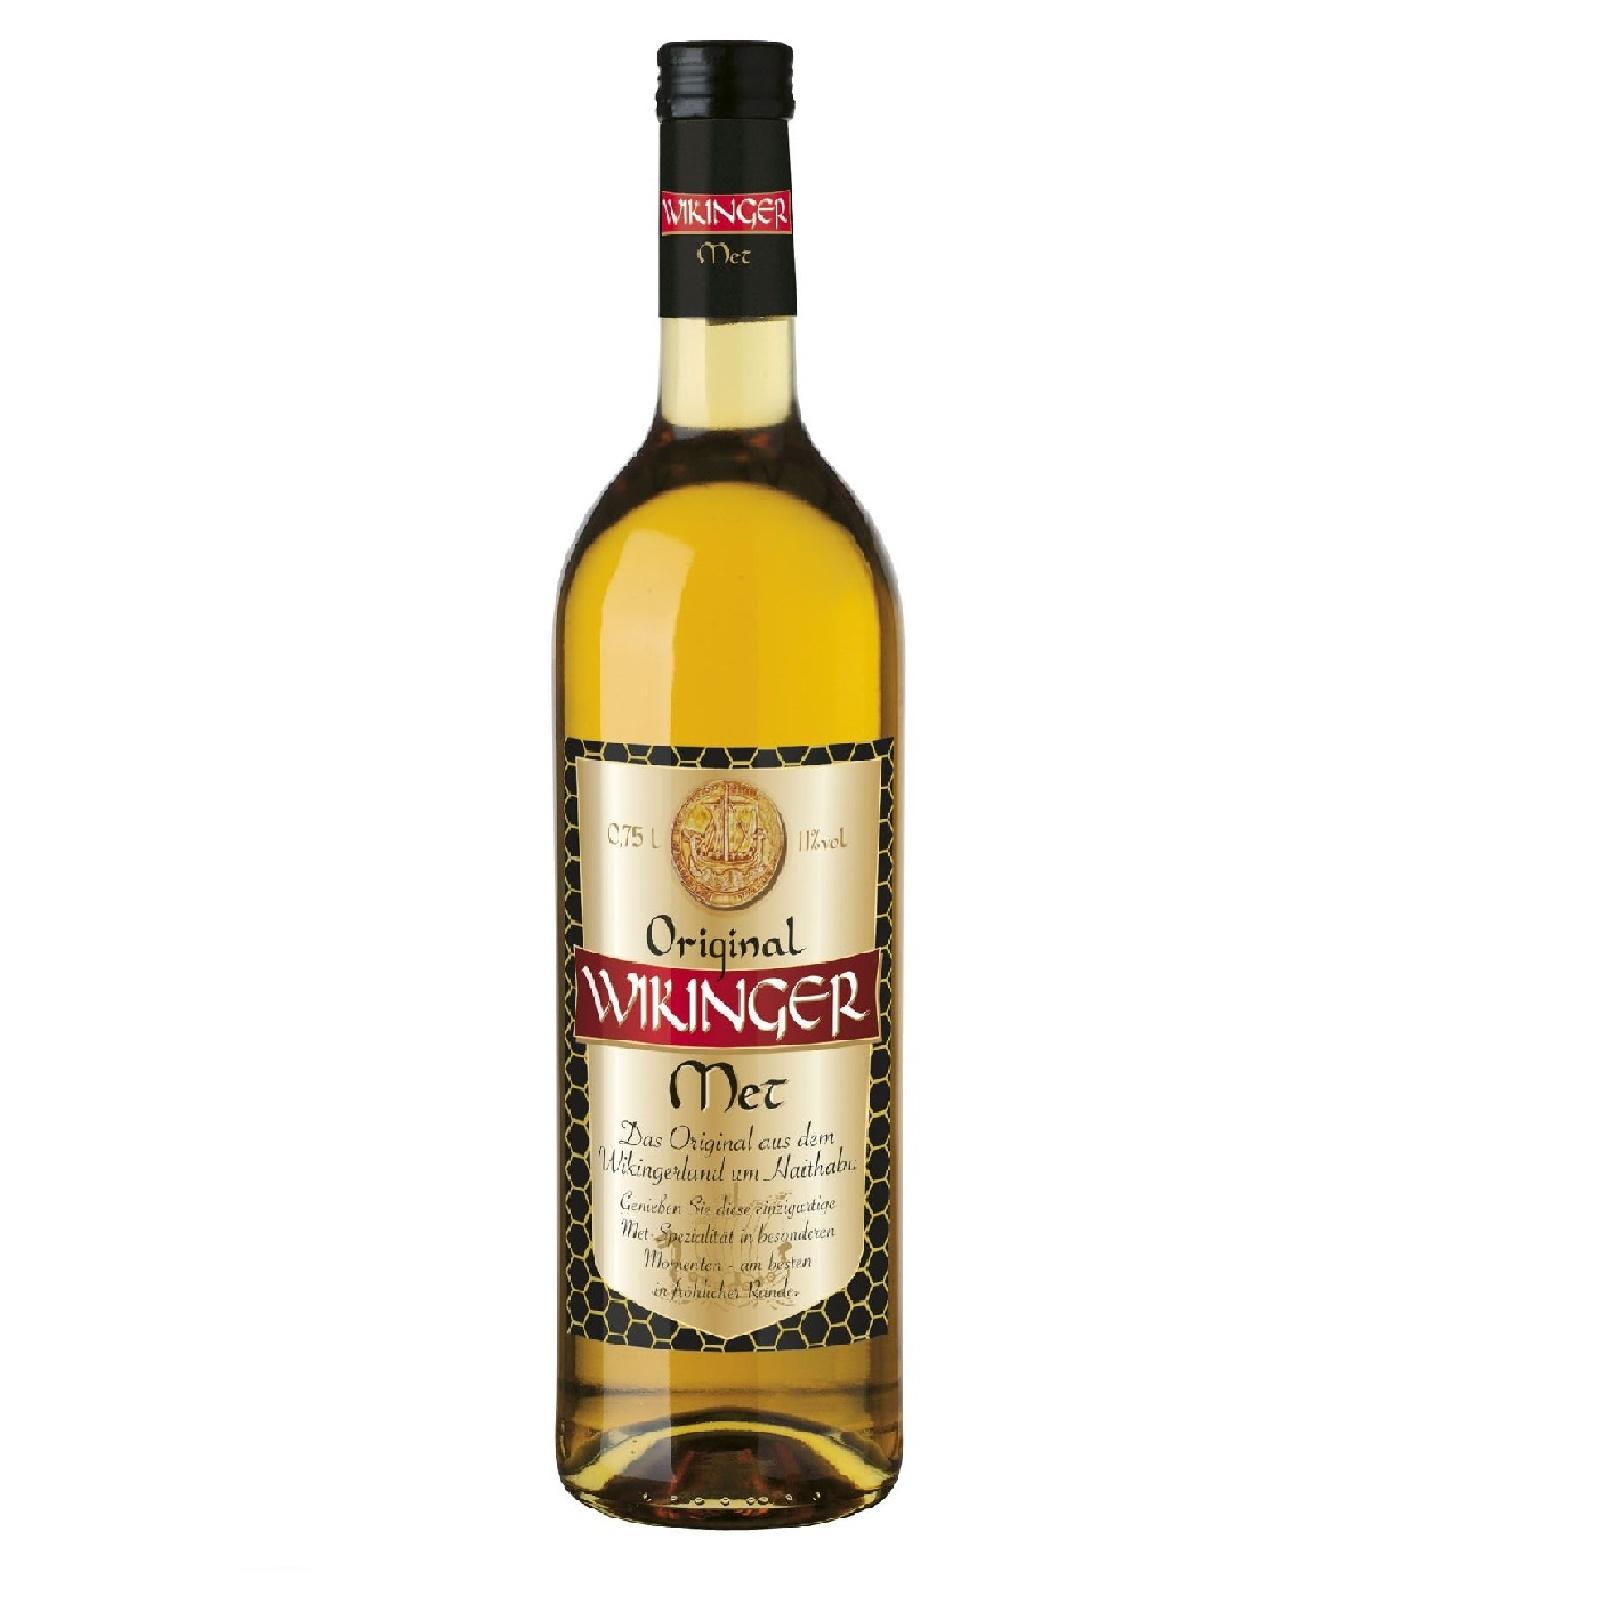 Wikinger Met Originaler Behn Honigwein 750 ml Flasche 11% Alkohol